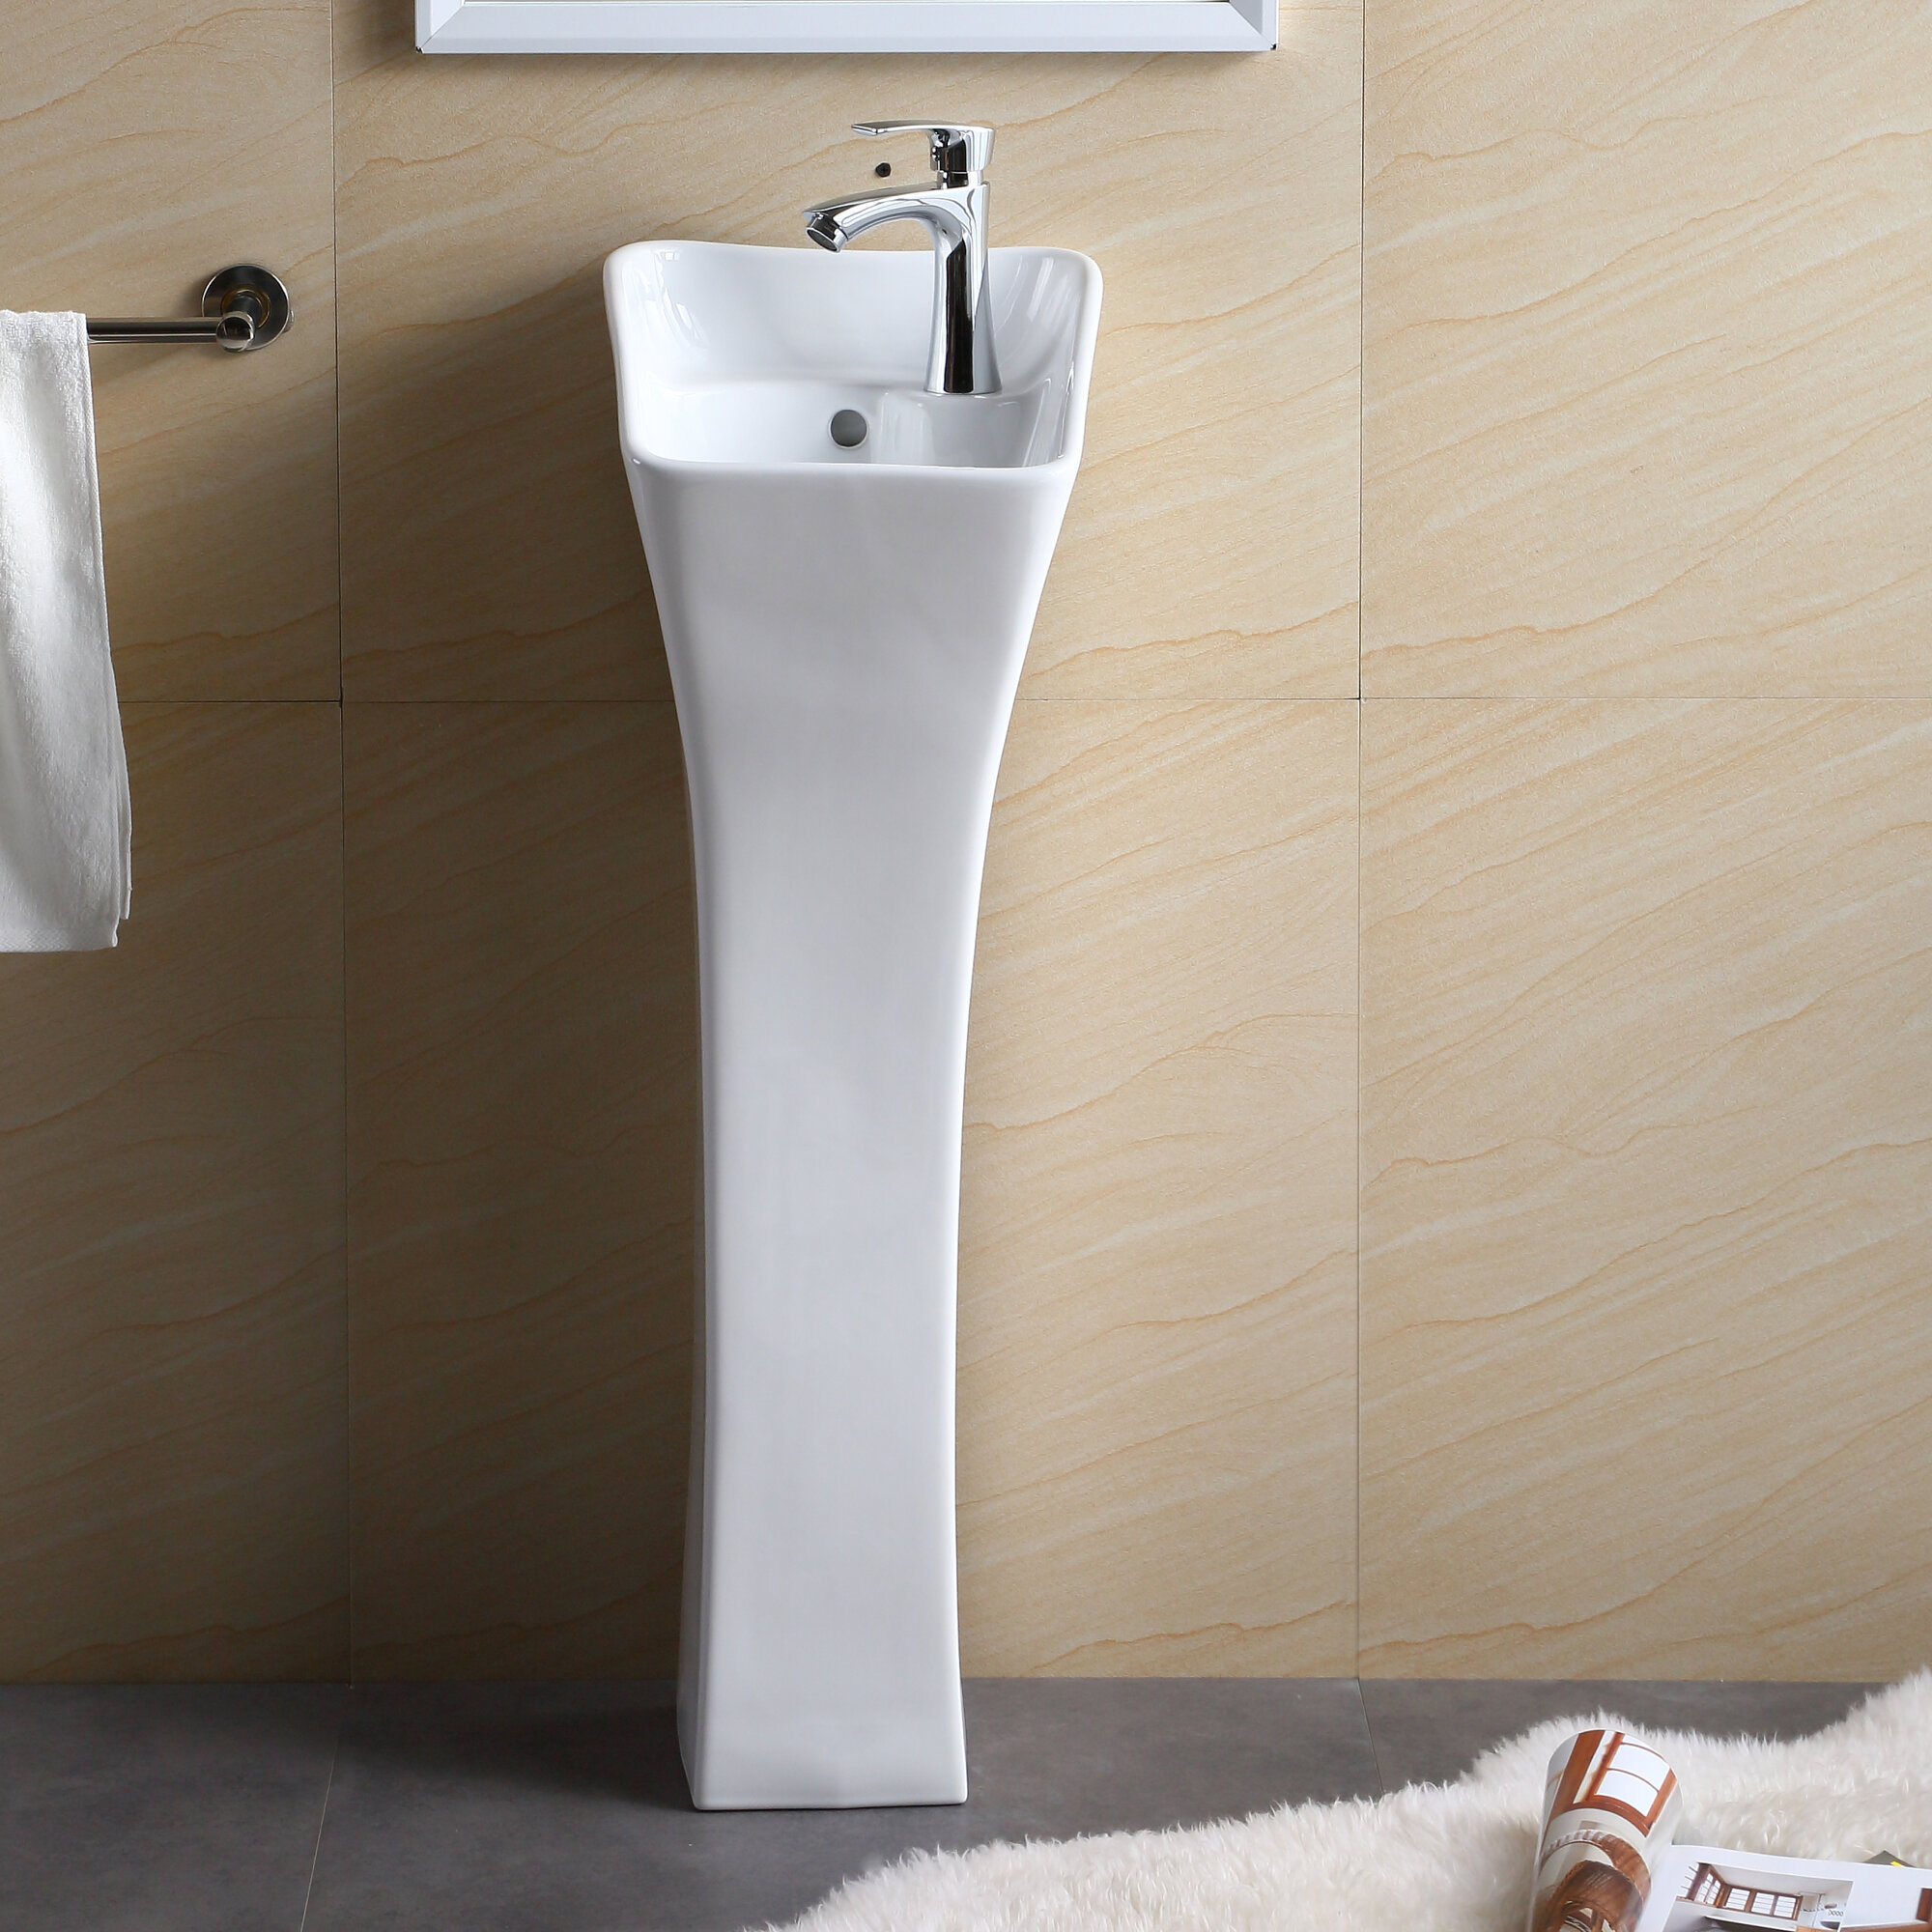 "Bathroom Sinks With Pedestals: Fine Fixtures Pedestal Series 13"" Bathroom Sink"